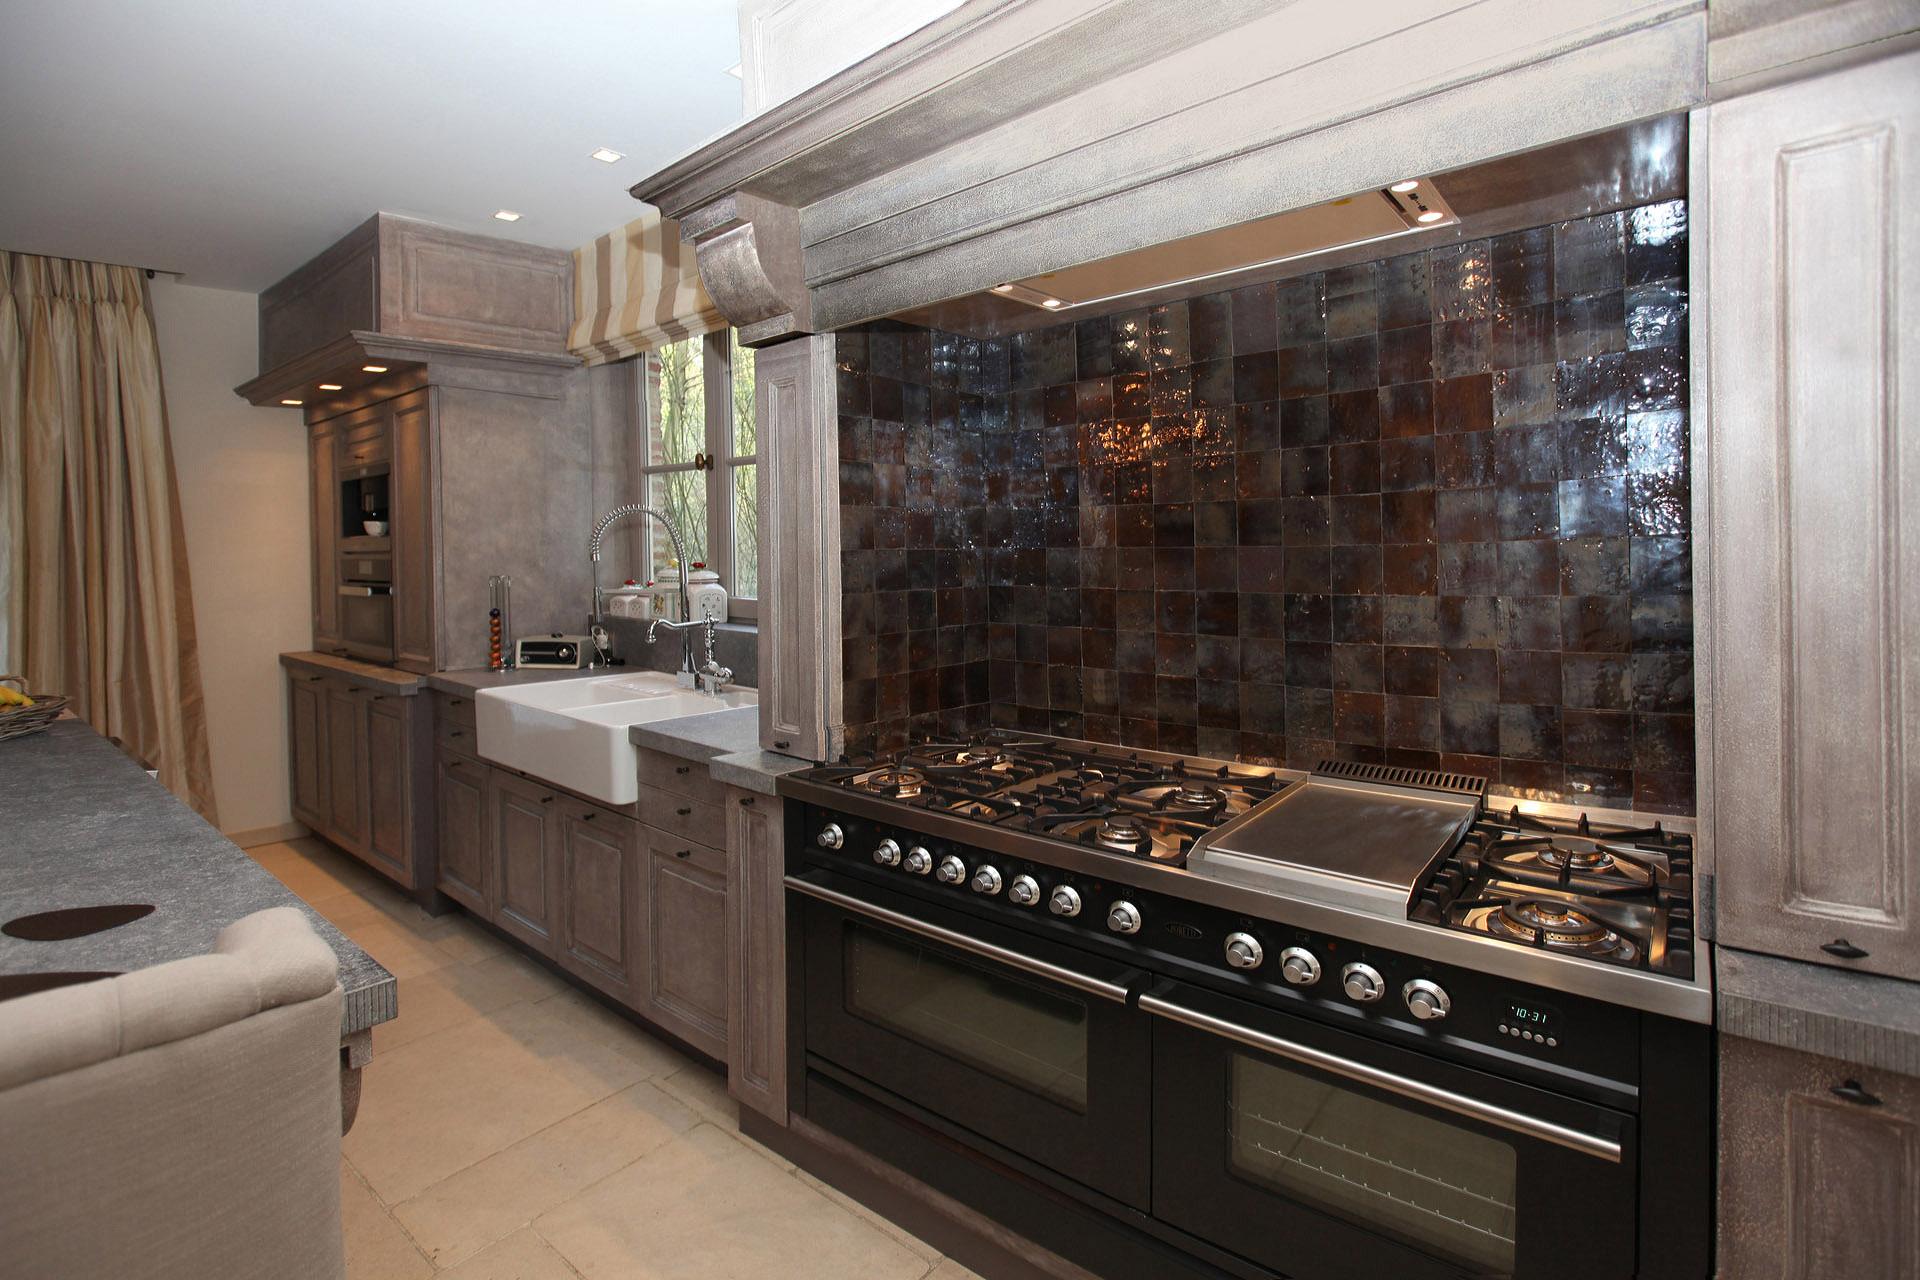 Küche nach Maß - Marcotte Style